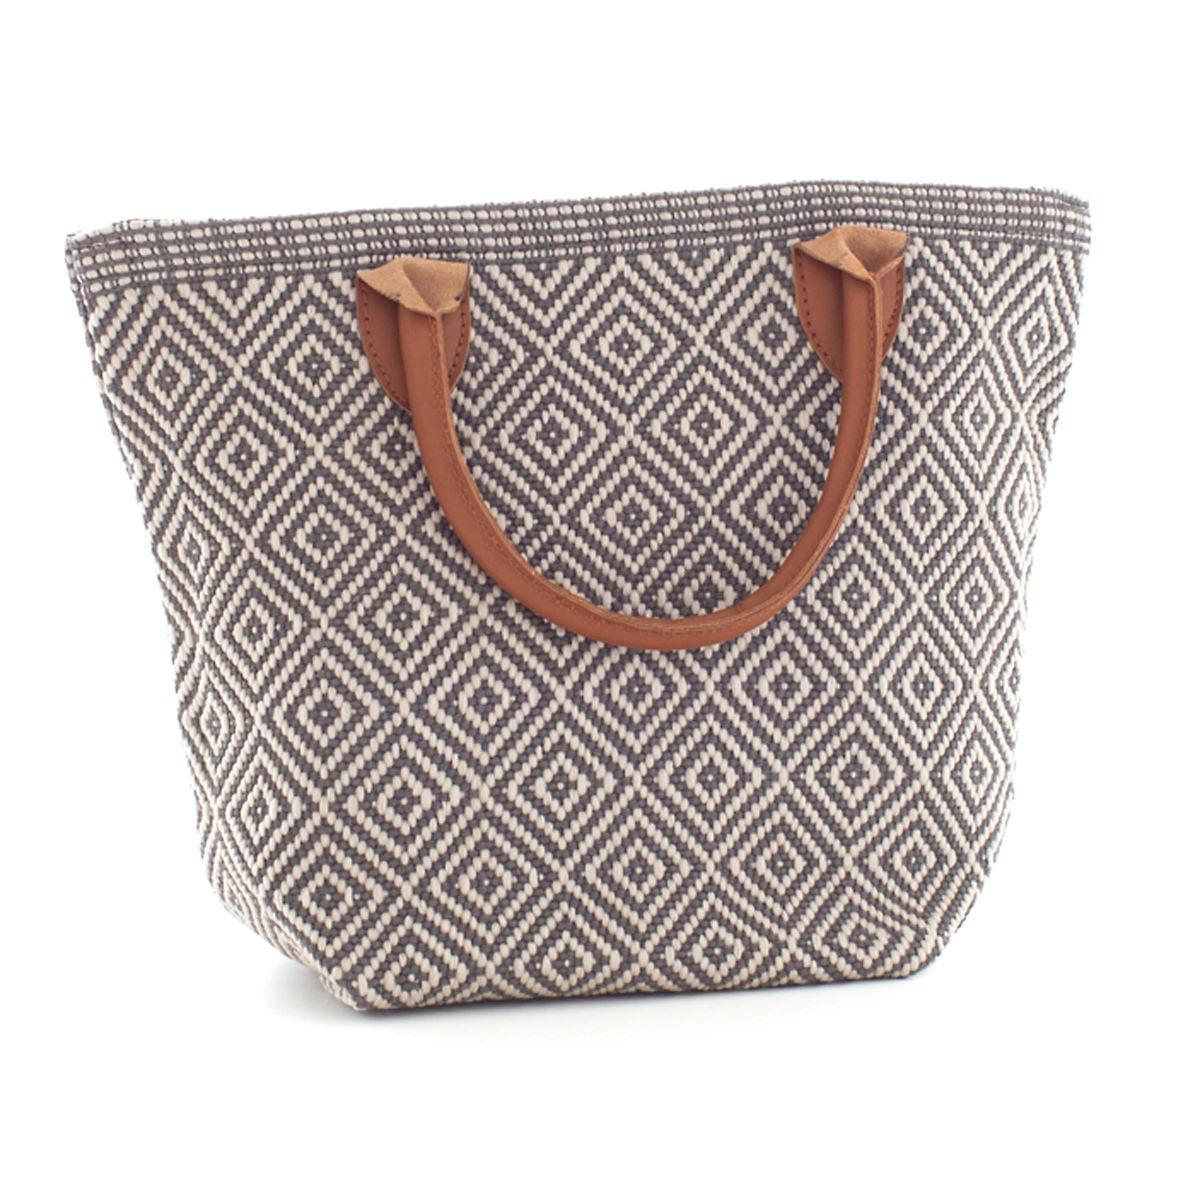 Fresh American Le Tote Graphite/Platinum  Tote Bag Petit